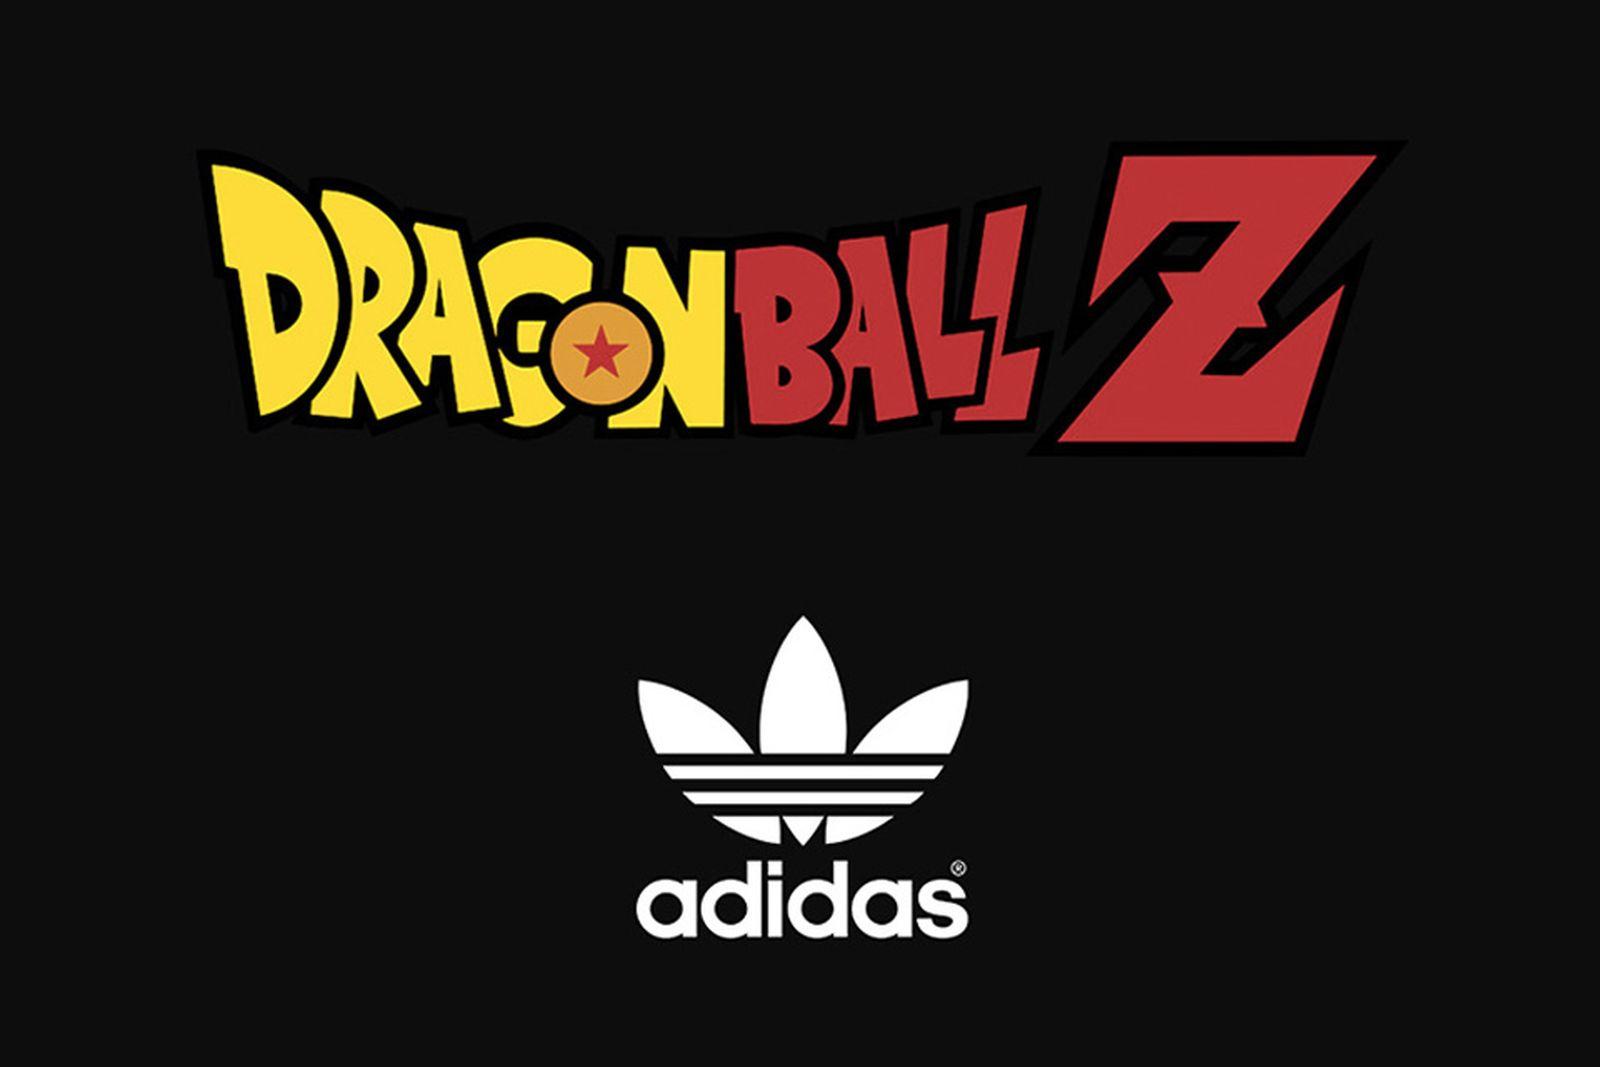 adidas dragon ball z collab confirmation Toei Animation adidas x Dragon Ball Z